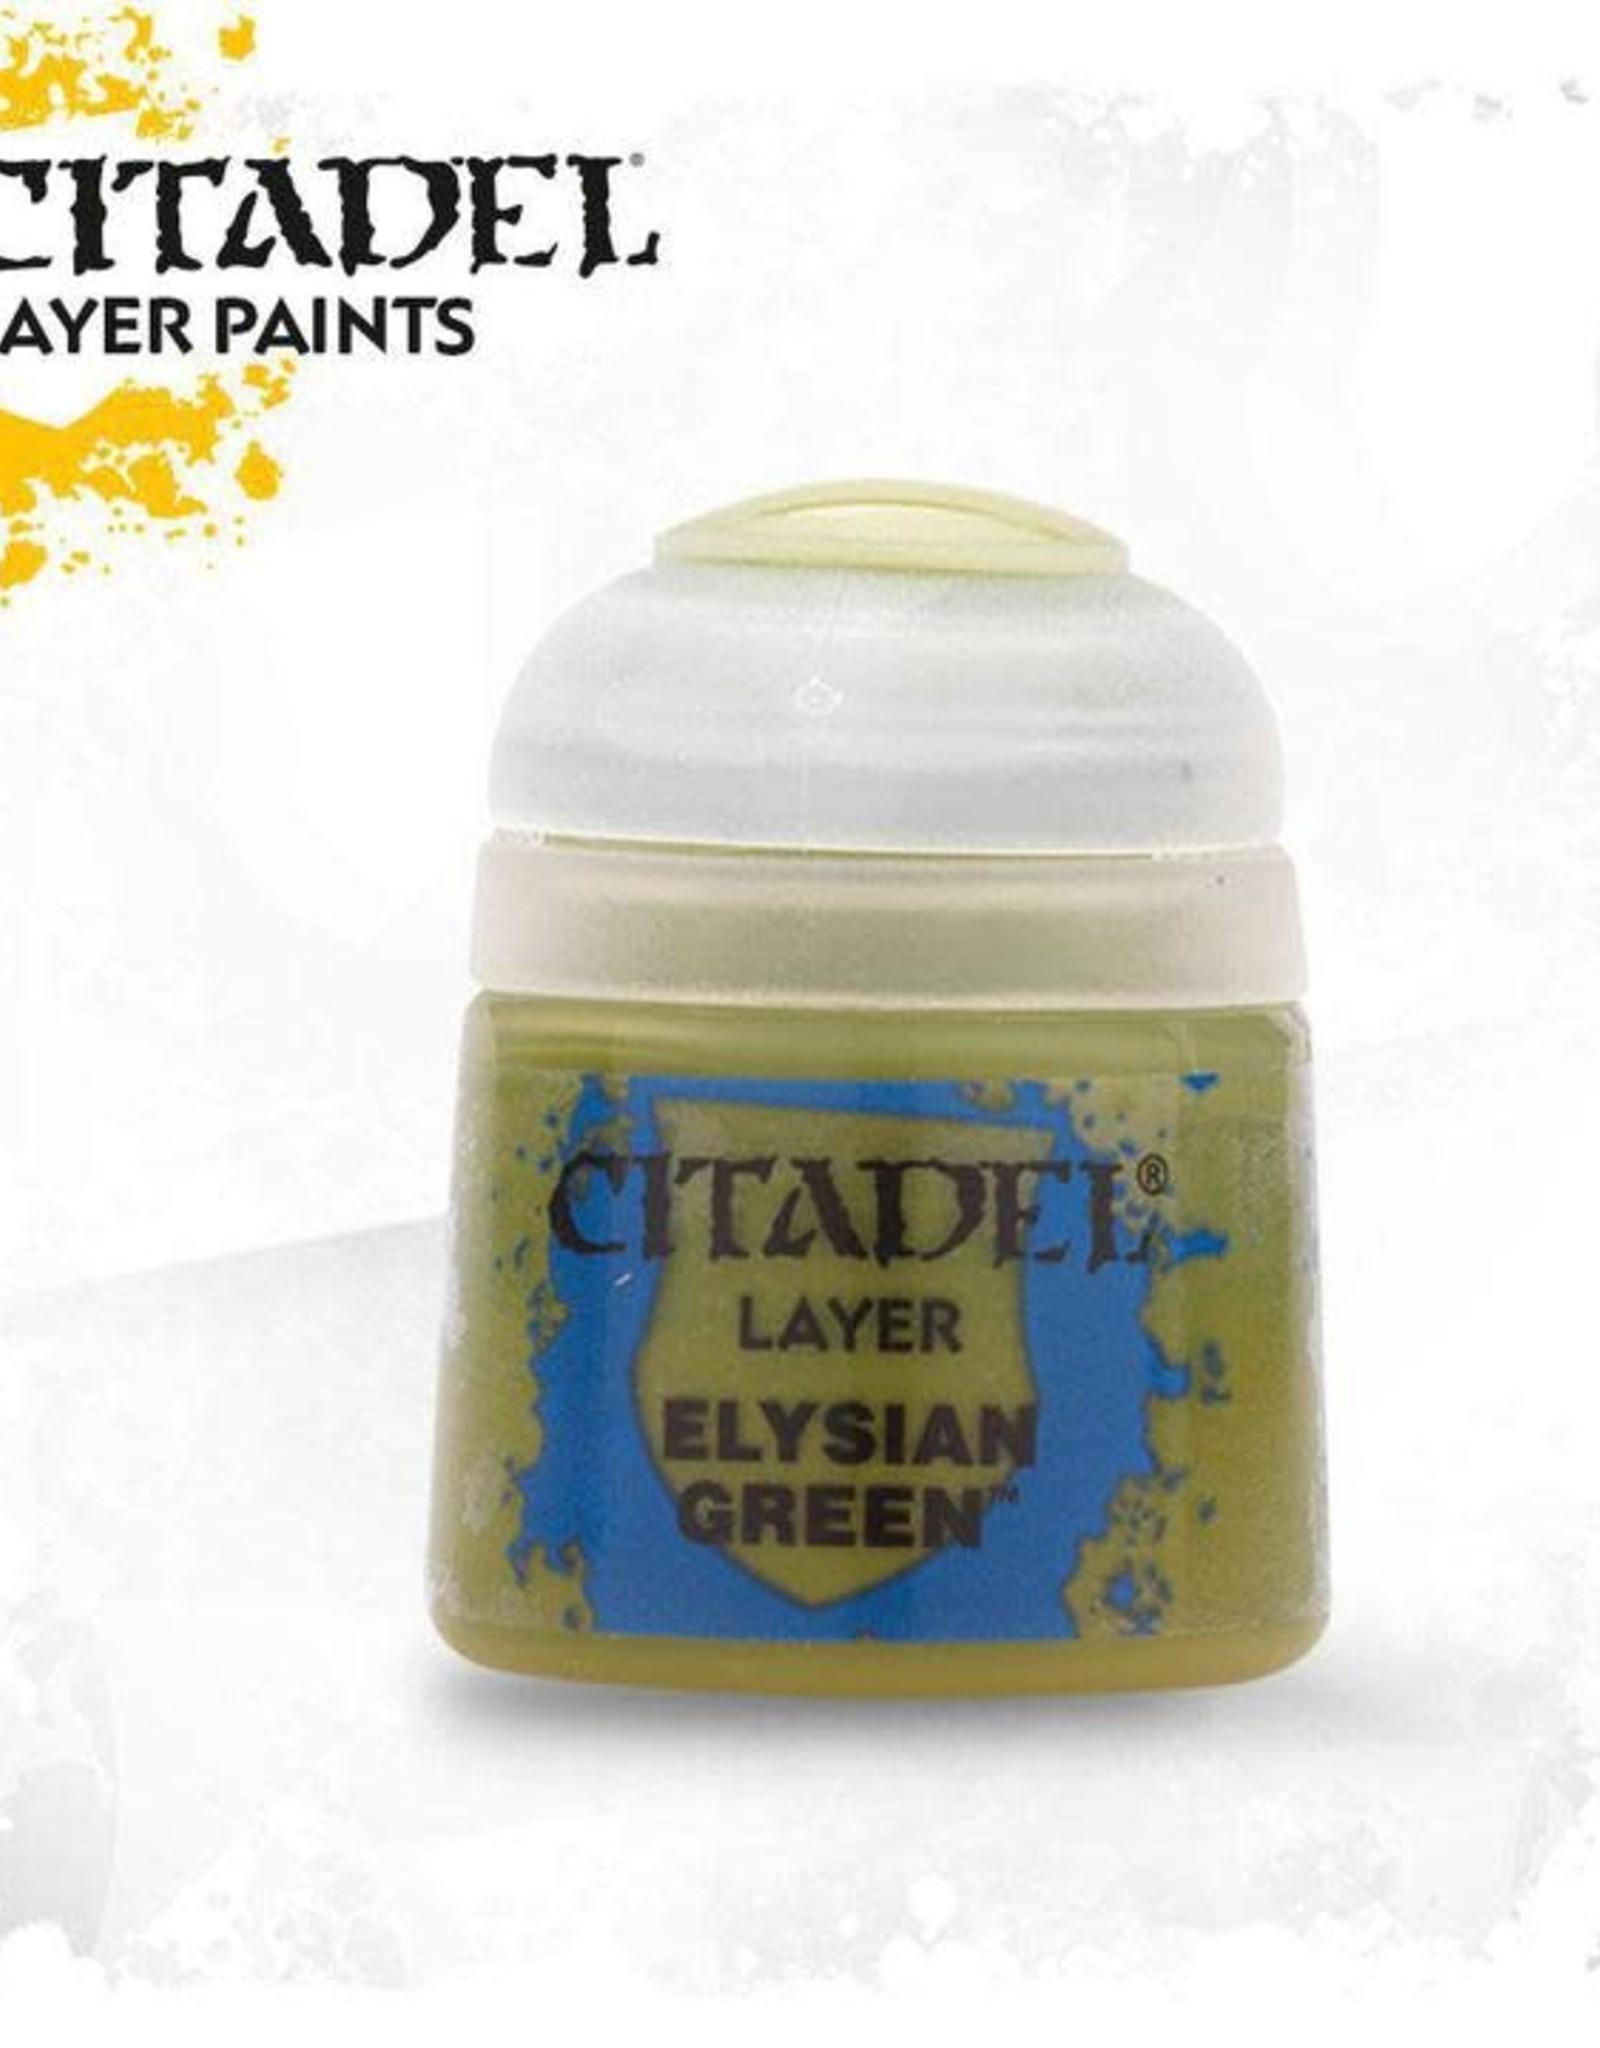 Games Workshop Citadel Paint: Layer - Elysian Green